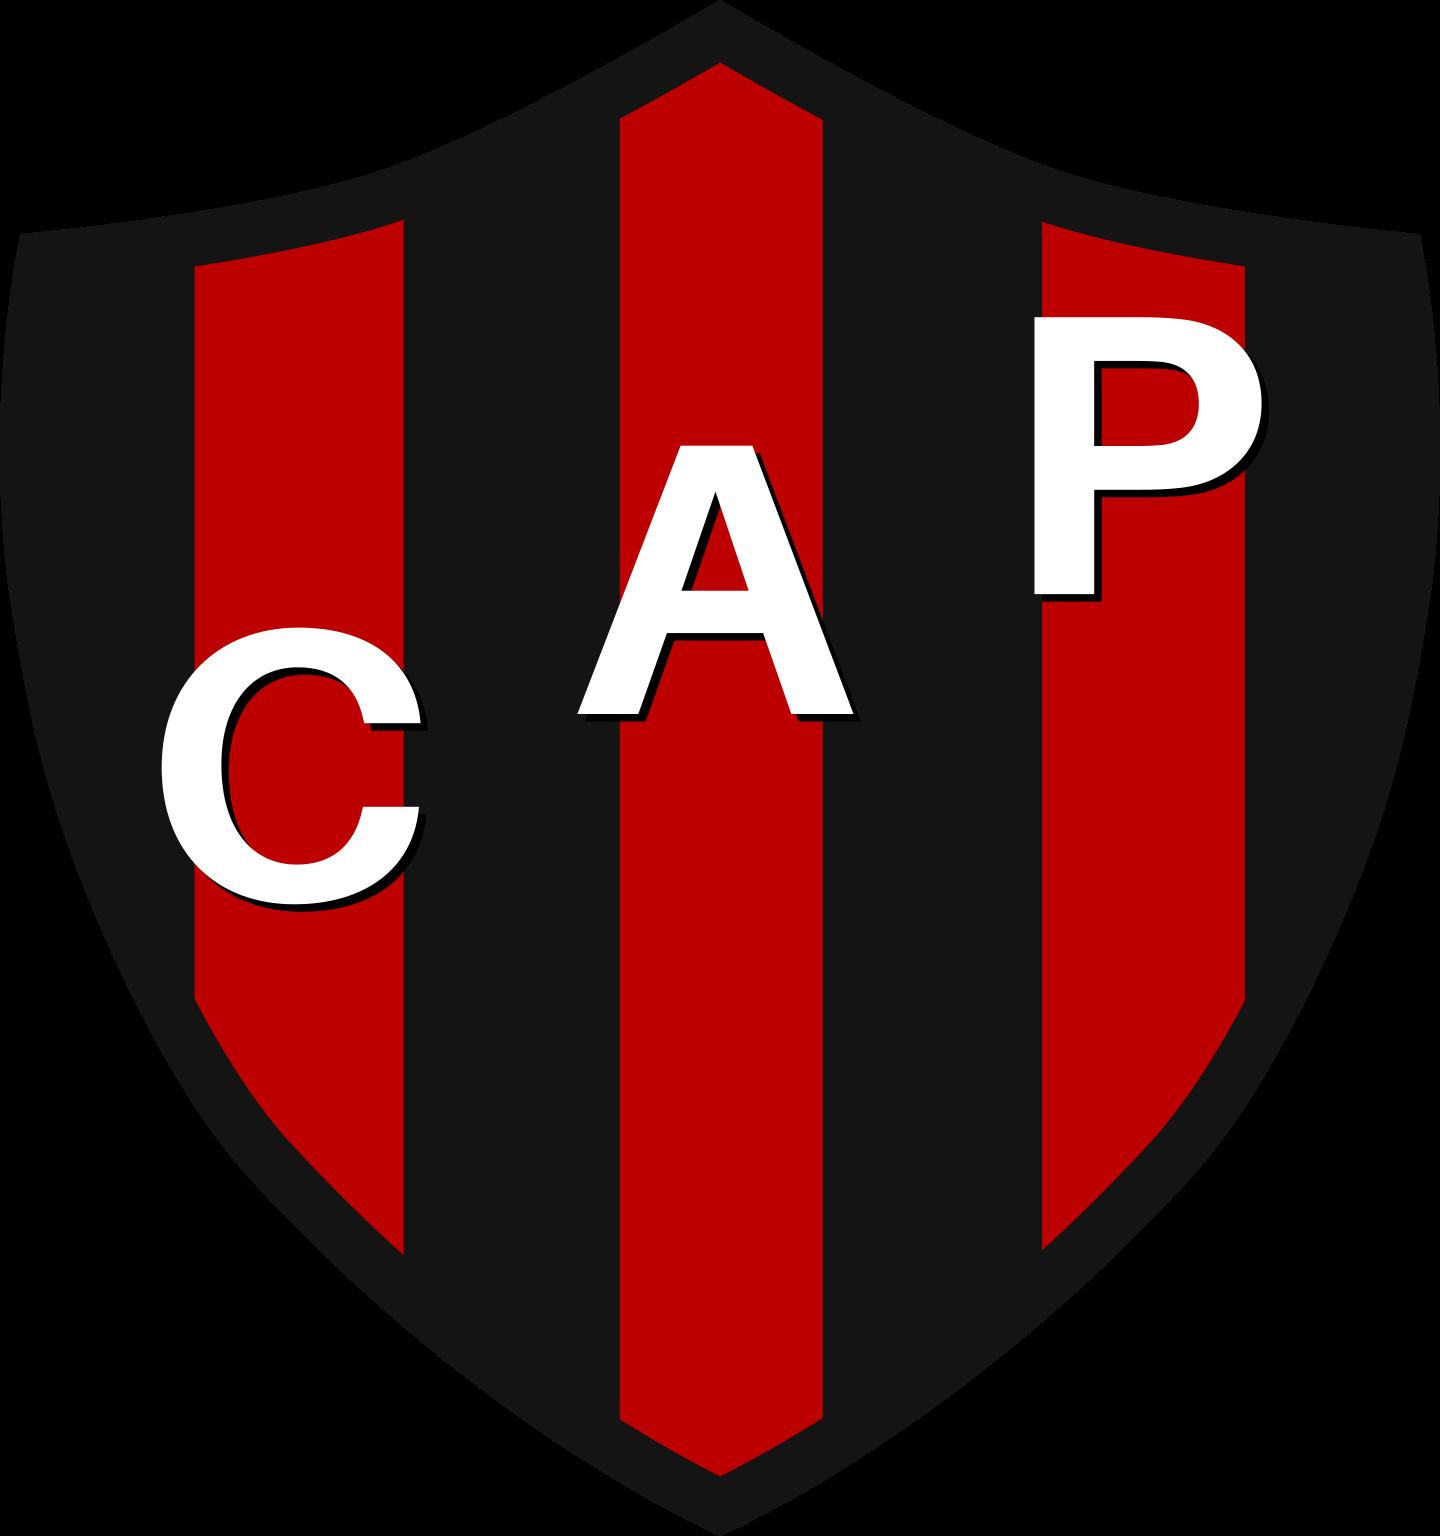 ca patronato logo 2 - Club Atlético Patronato Logo – Escudo